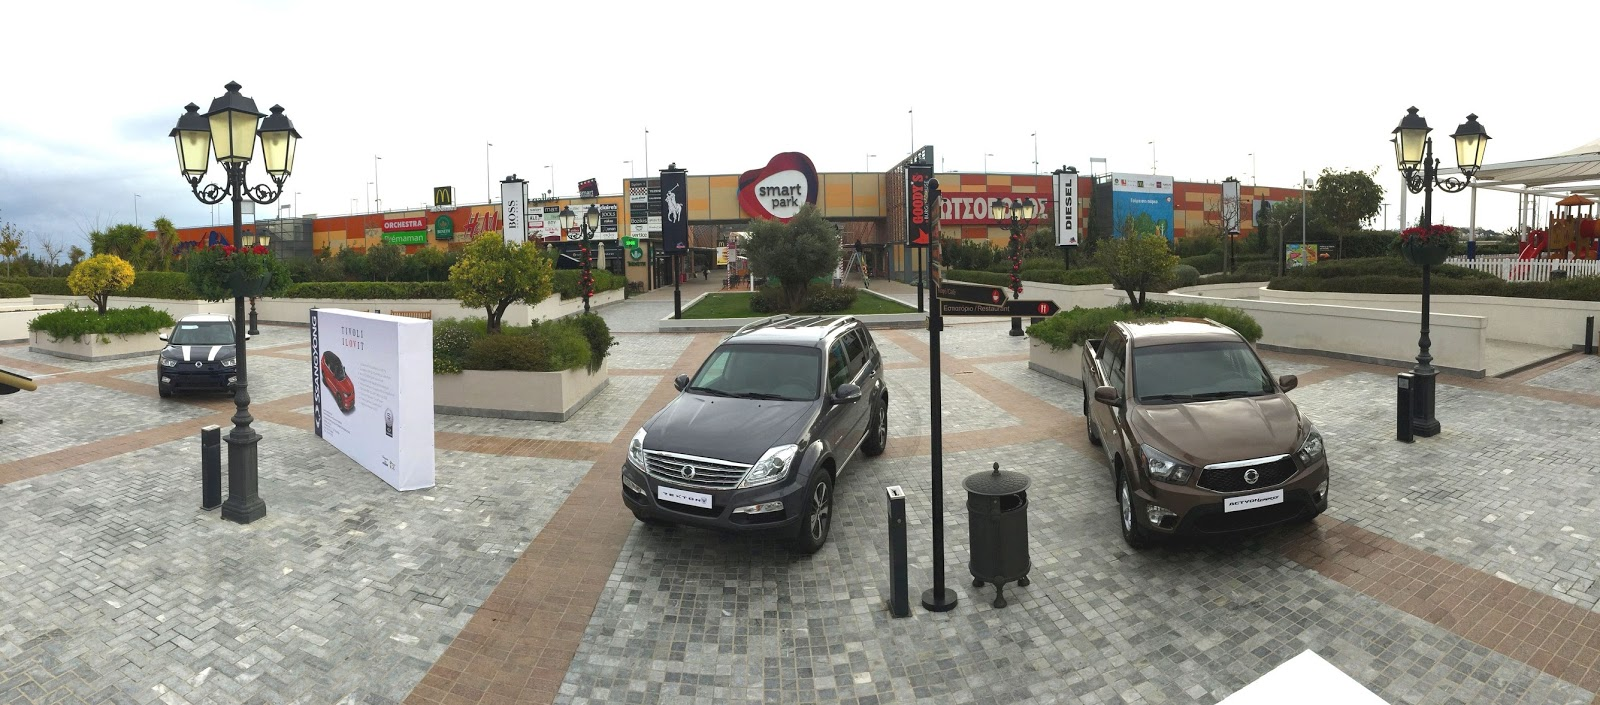 3%2BSY%2BMAG Δες και οδήγησε το SsangYong TIVOLI 1.6 Diesel στο εμπορικό κέντρο McARTHURGLEN SsangYong, SsangYong Actyon, SsangYong Actyon Sports, SsangYong Rexton, SsangYong Tivoli